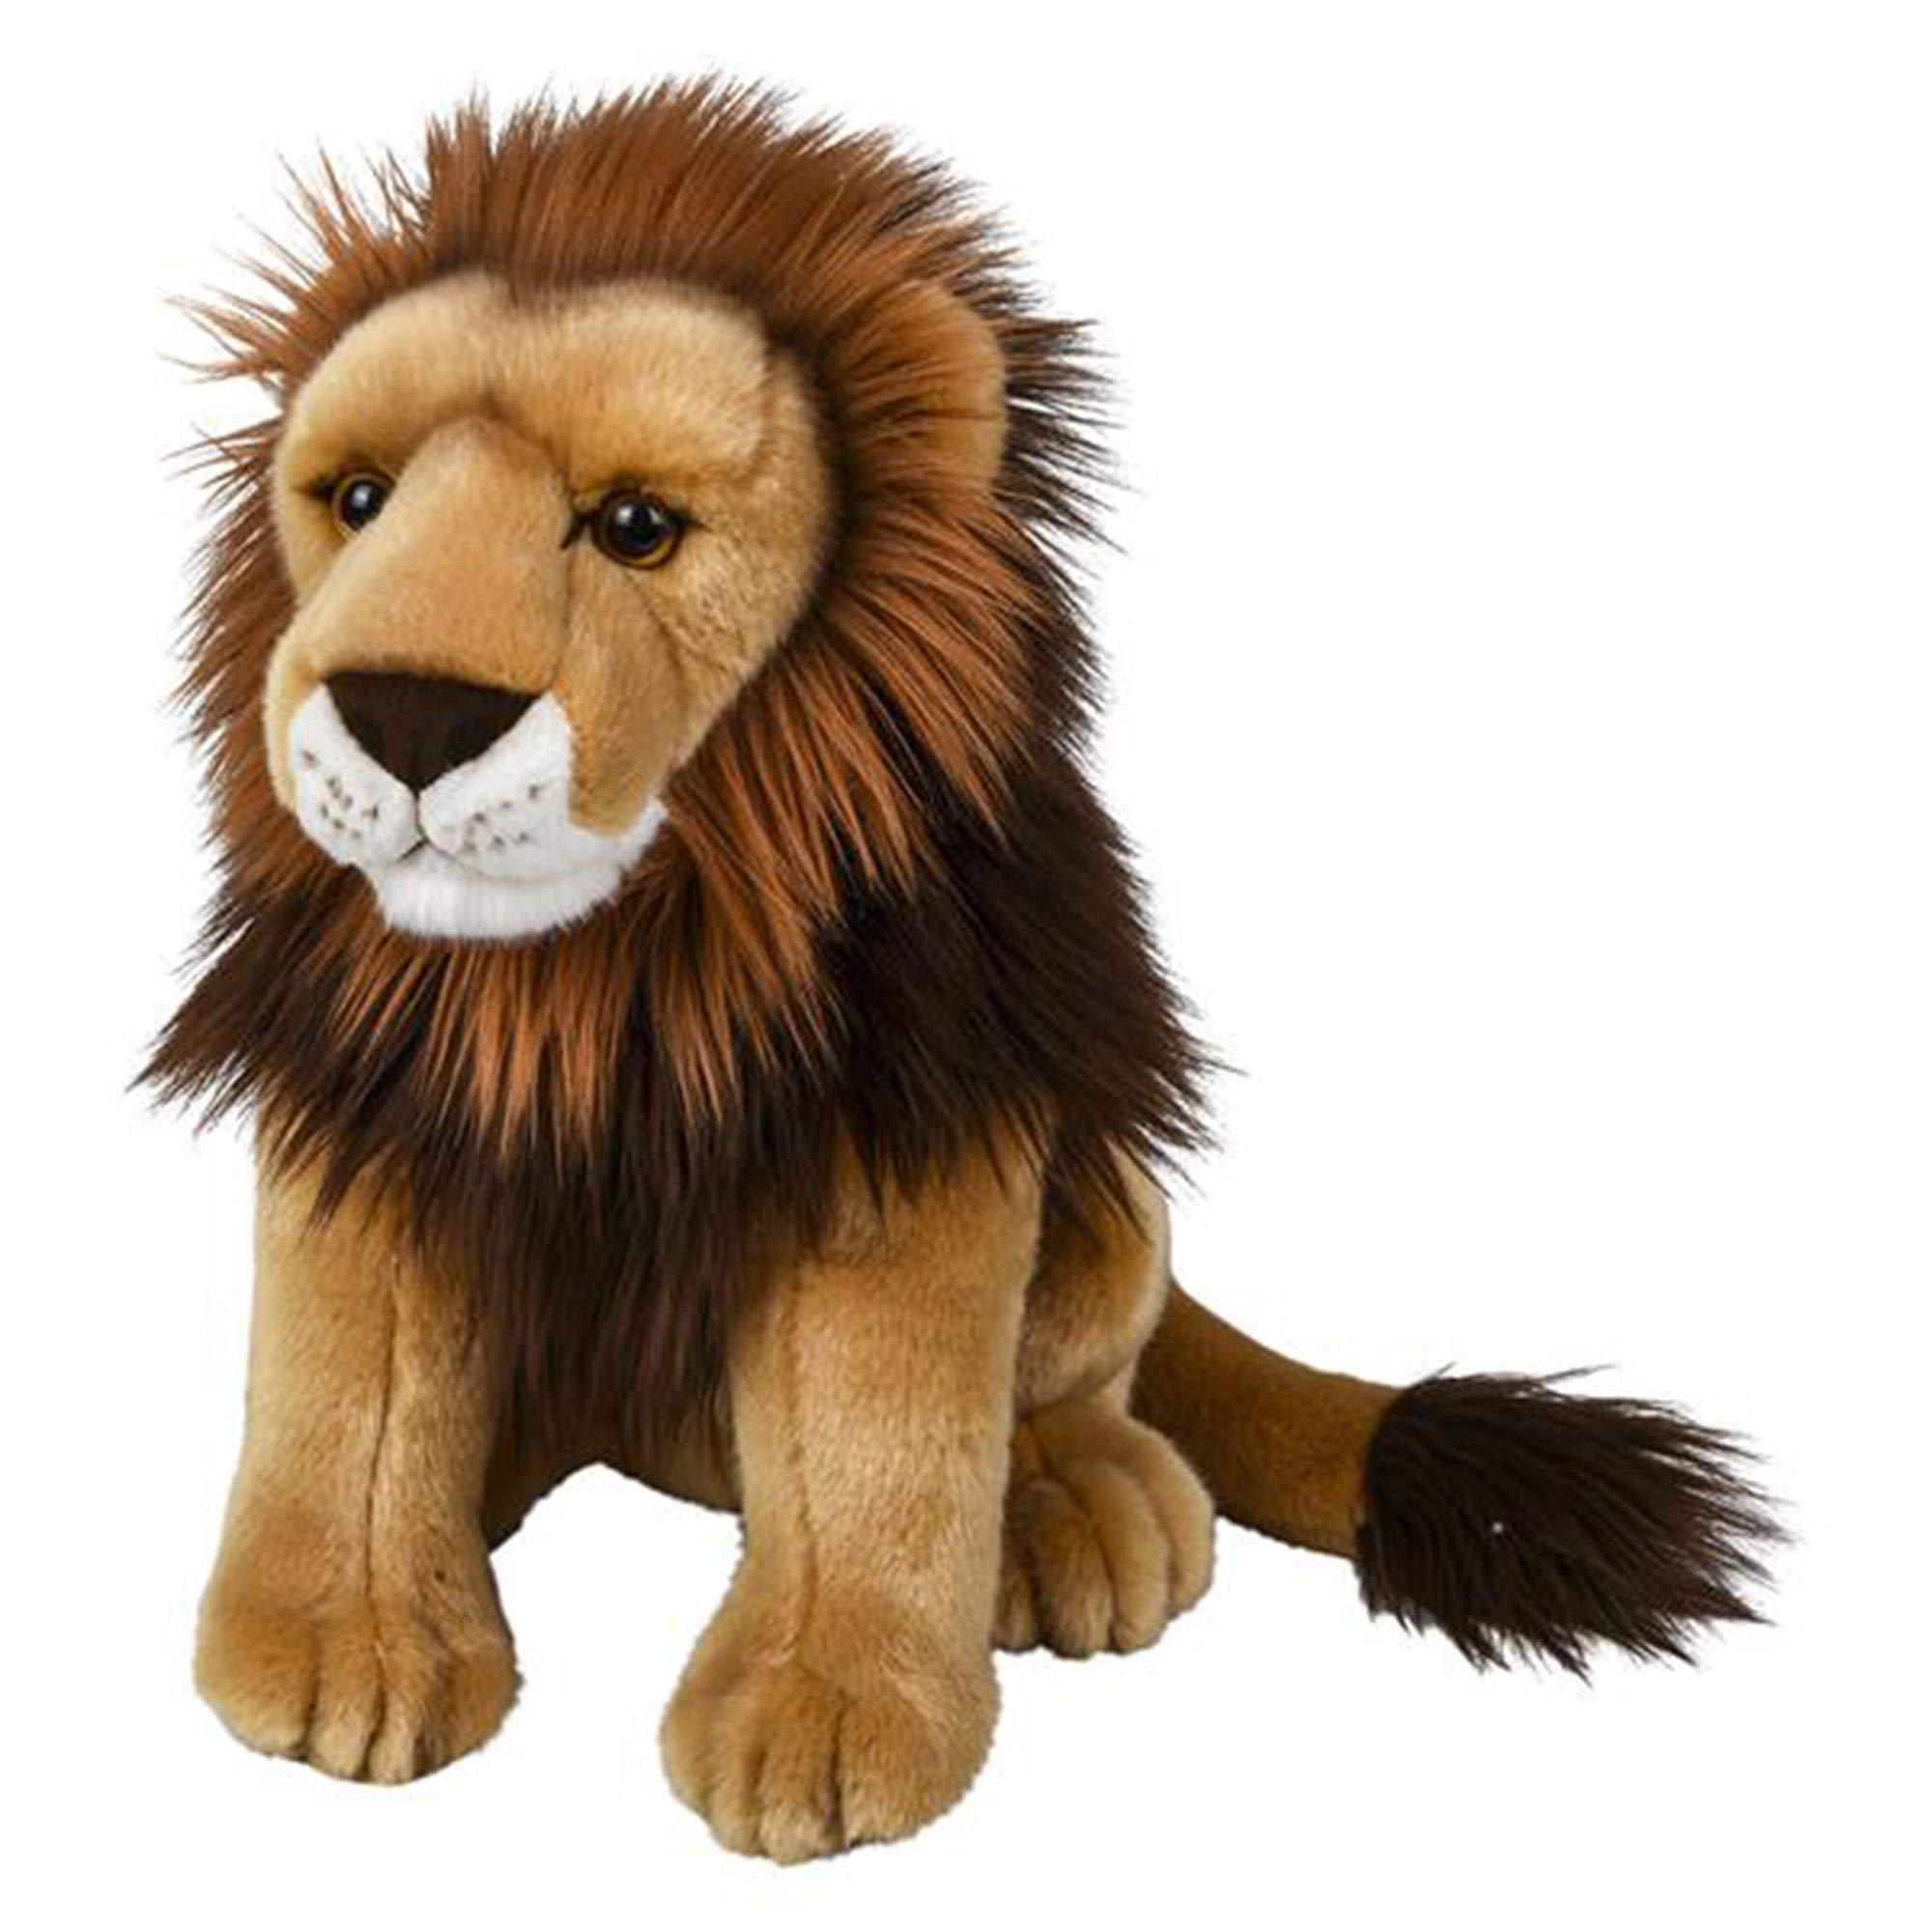 Wildlife Tree 15 Inch Stuffed Lion Plush Floppy Animal Kingdom Collection by Wildlife Tree